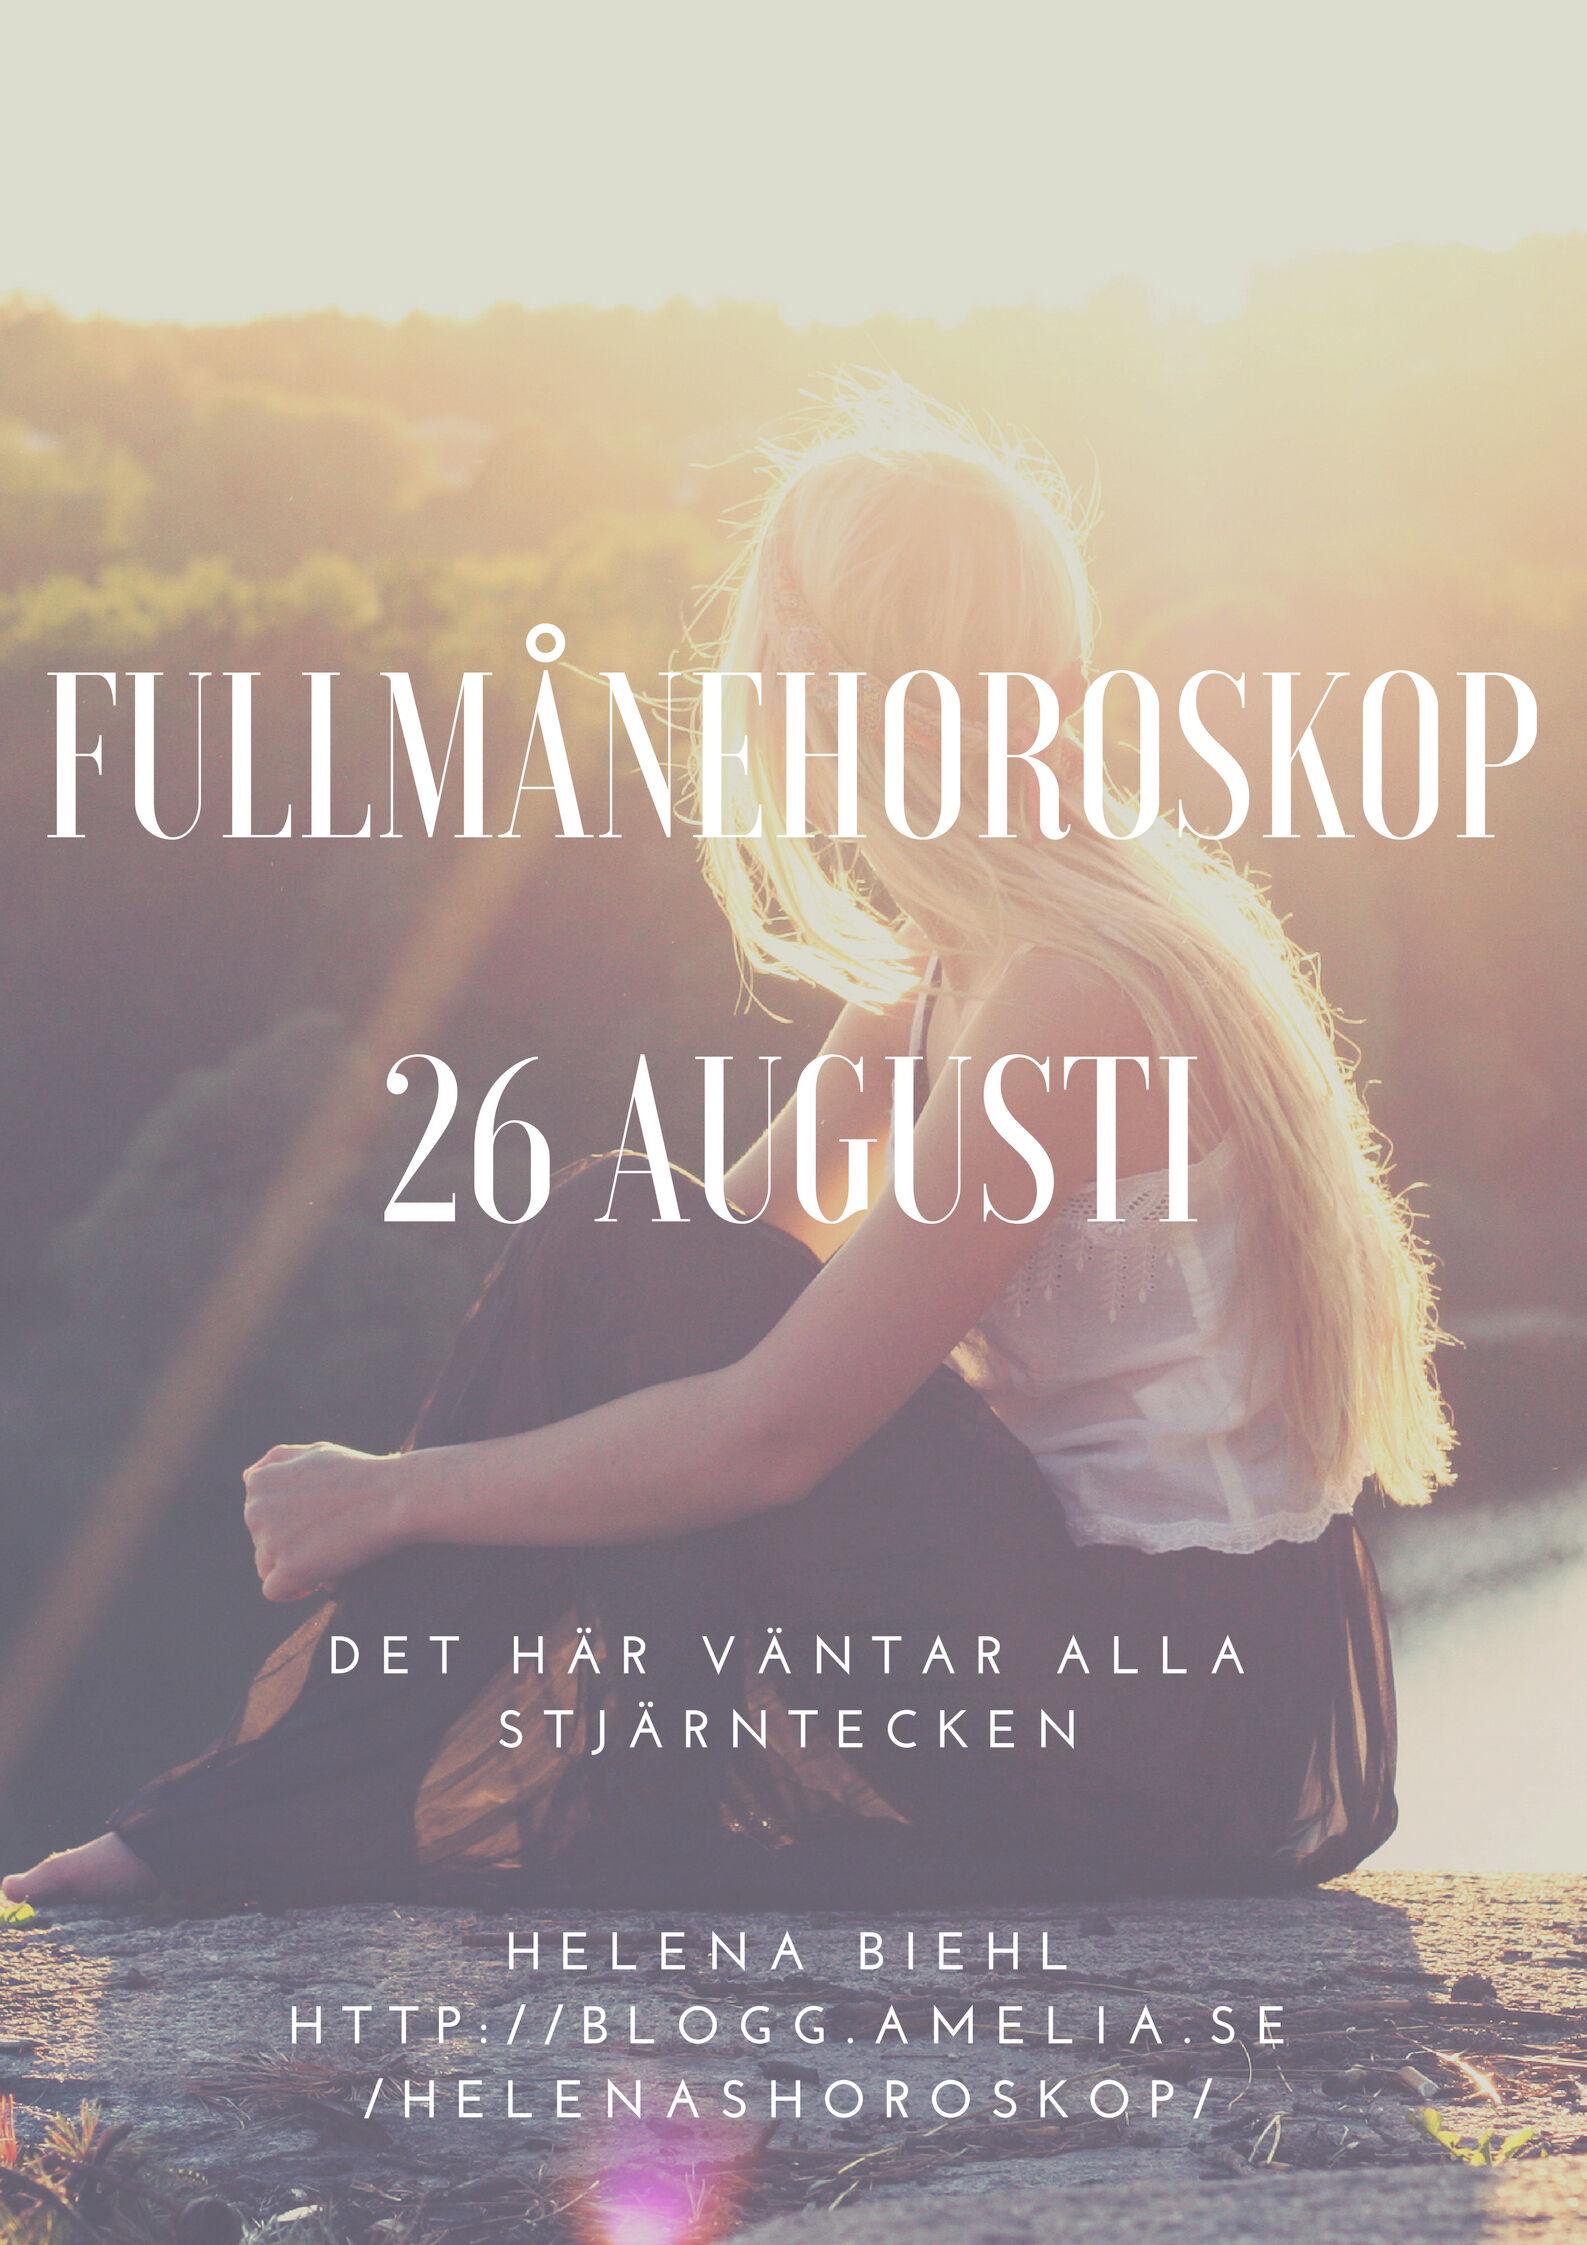 Fullmanehoroskop26 augusti